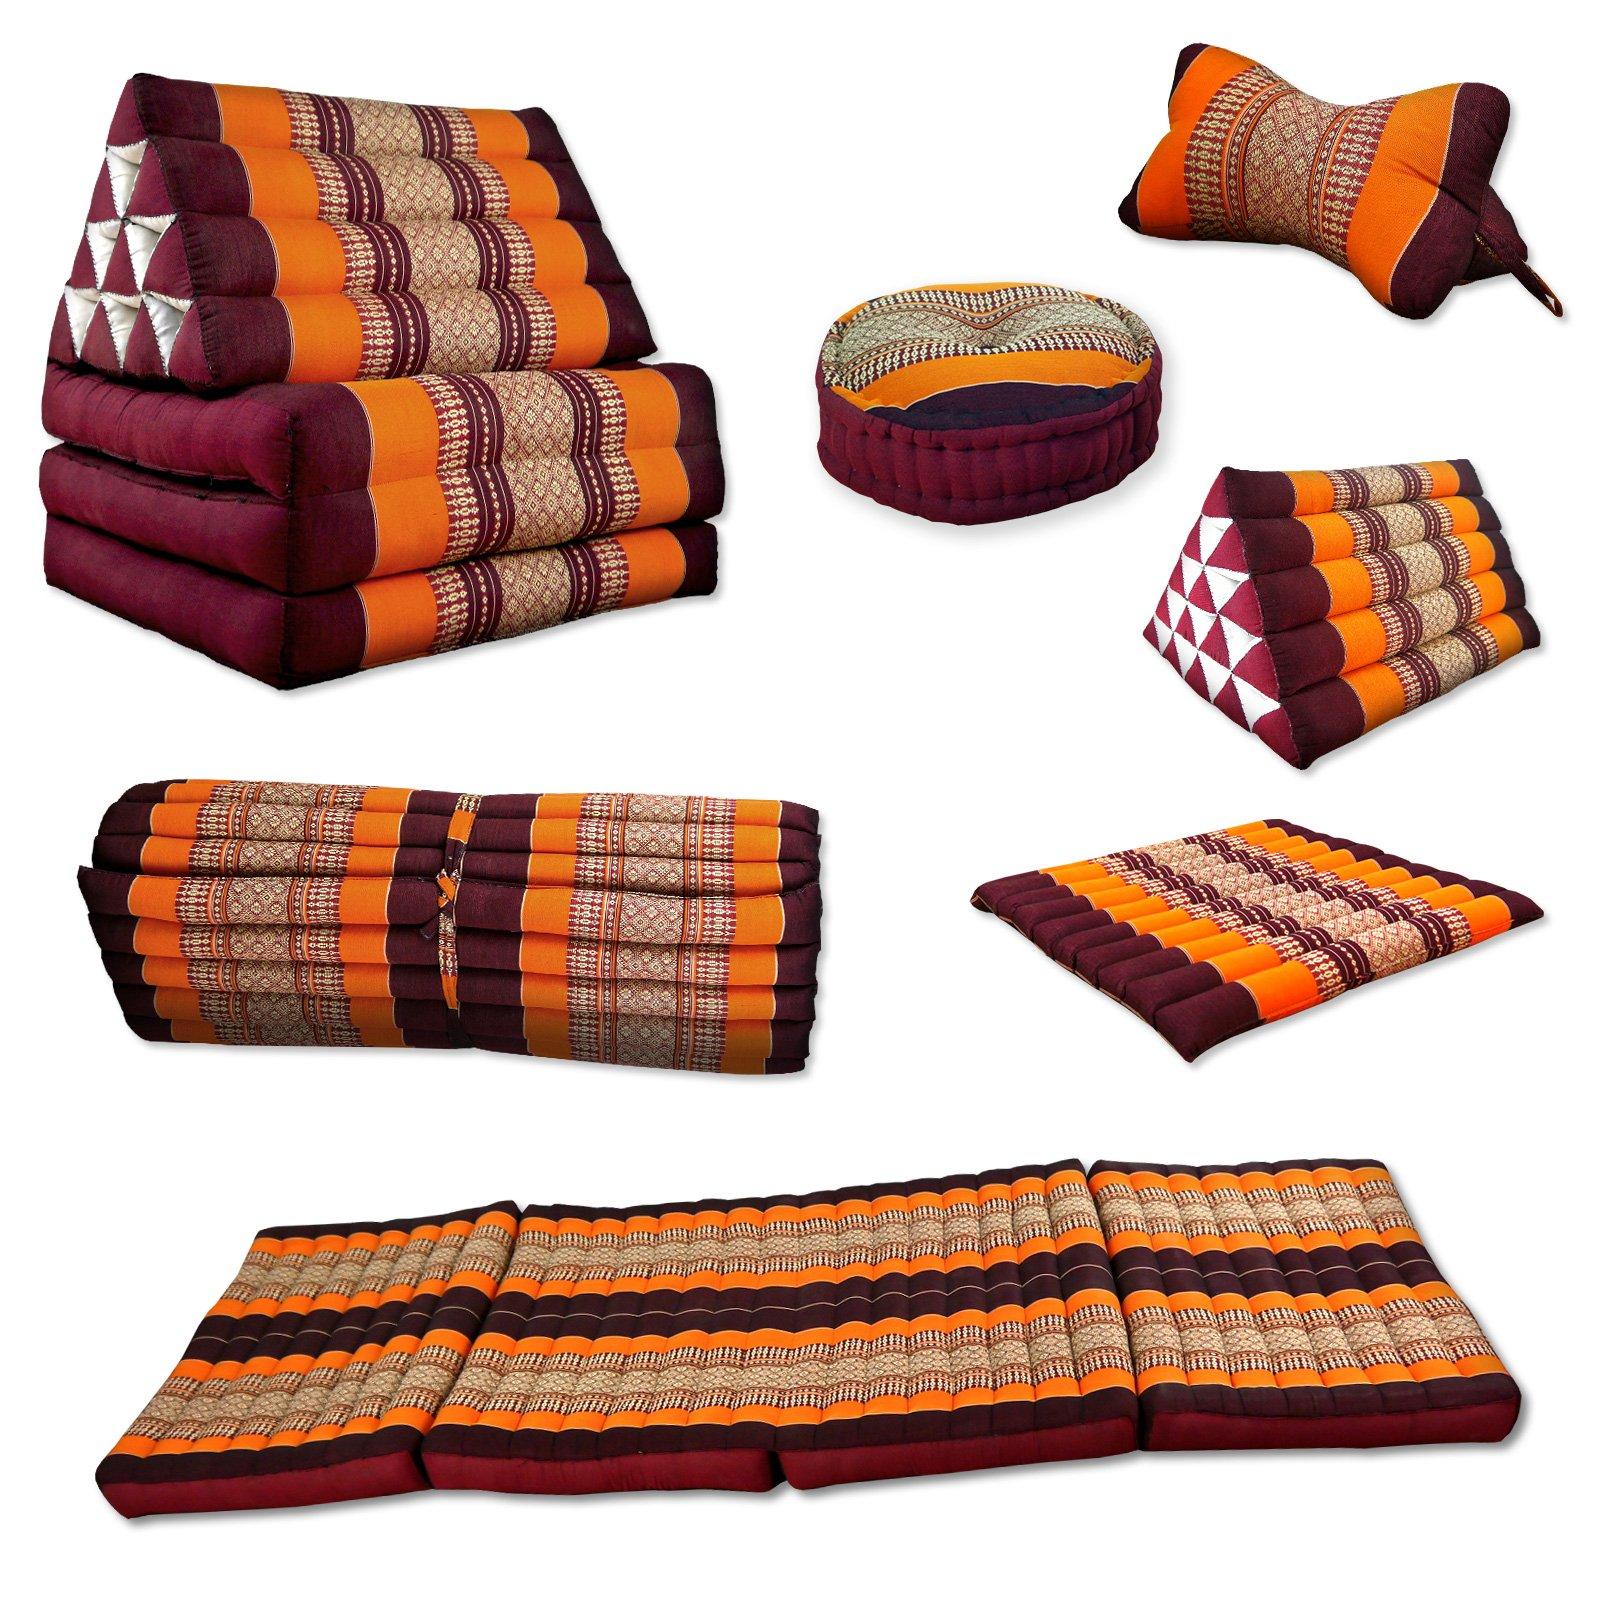 Asia Wohnstudio 2 Fold With Extra Large Triangle Cushion, 100% Natural Kapok Filling,Thai Xxl Jumbo Thai Pillow, Headrest (Thai Cushion Seat Folds) Folds